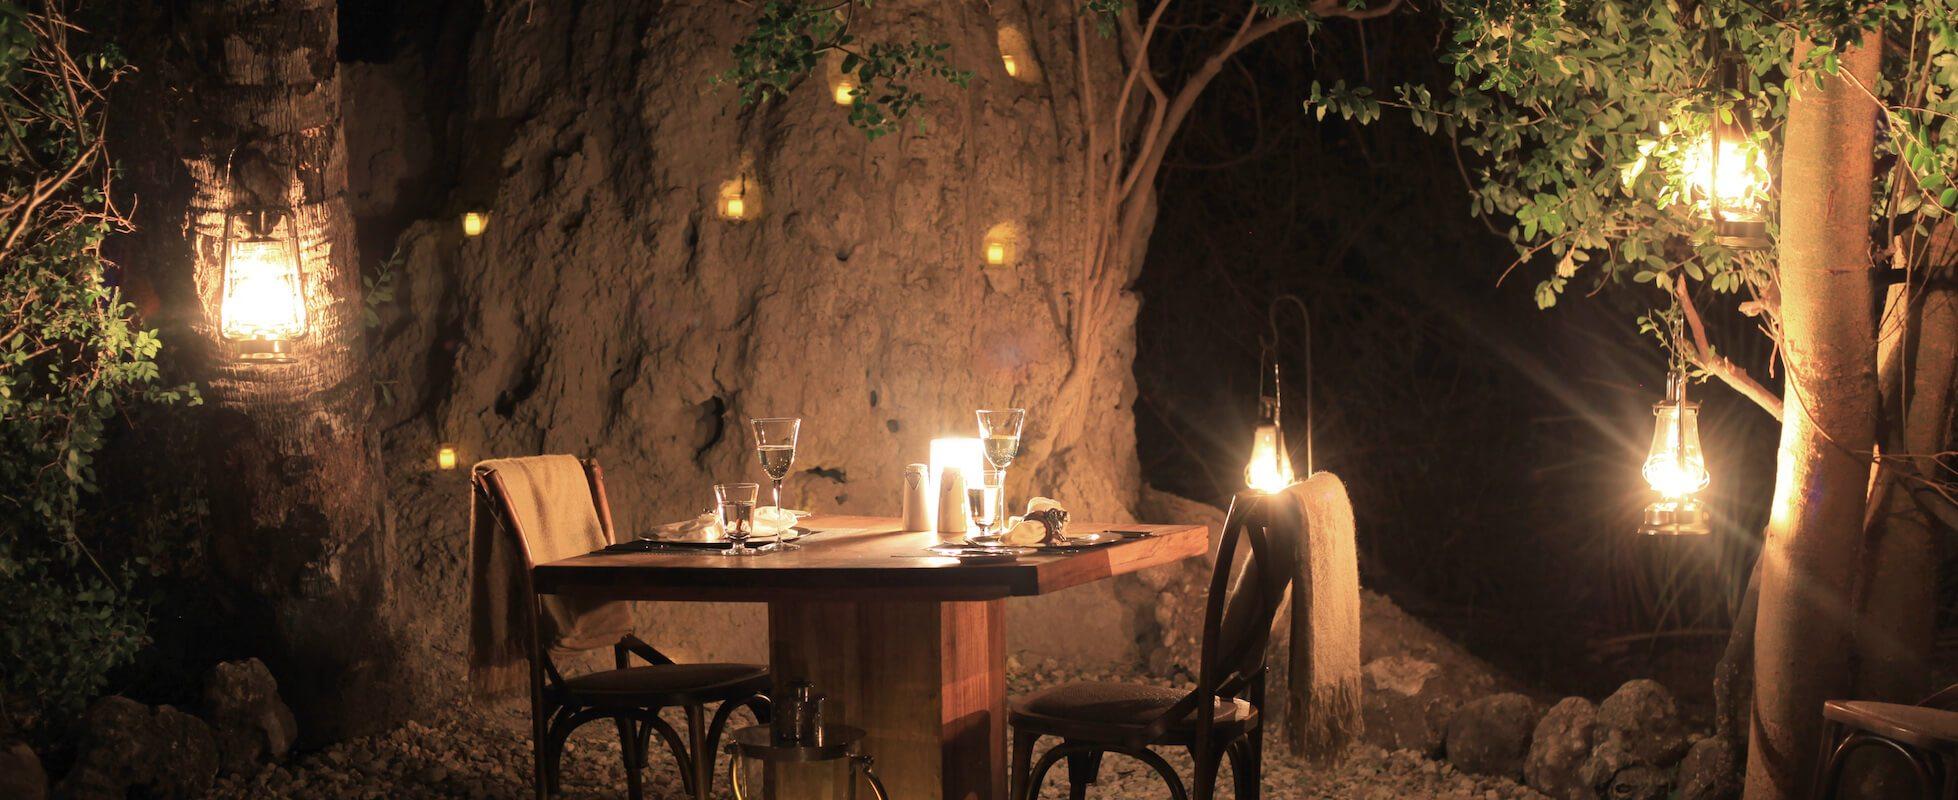 Tanzania_NorthManyara_Chem Chem Private Dining Celebration Dinner